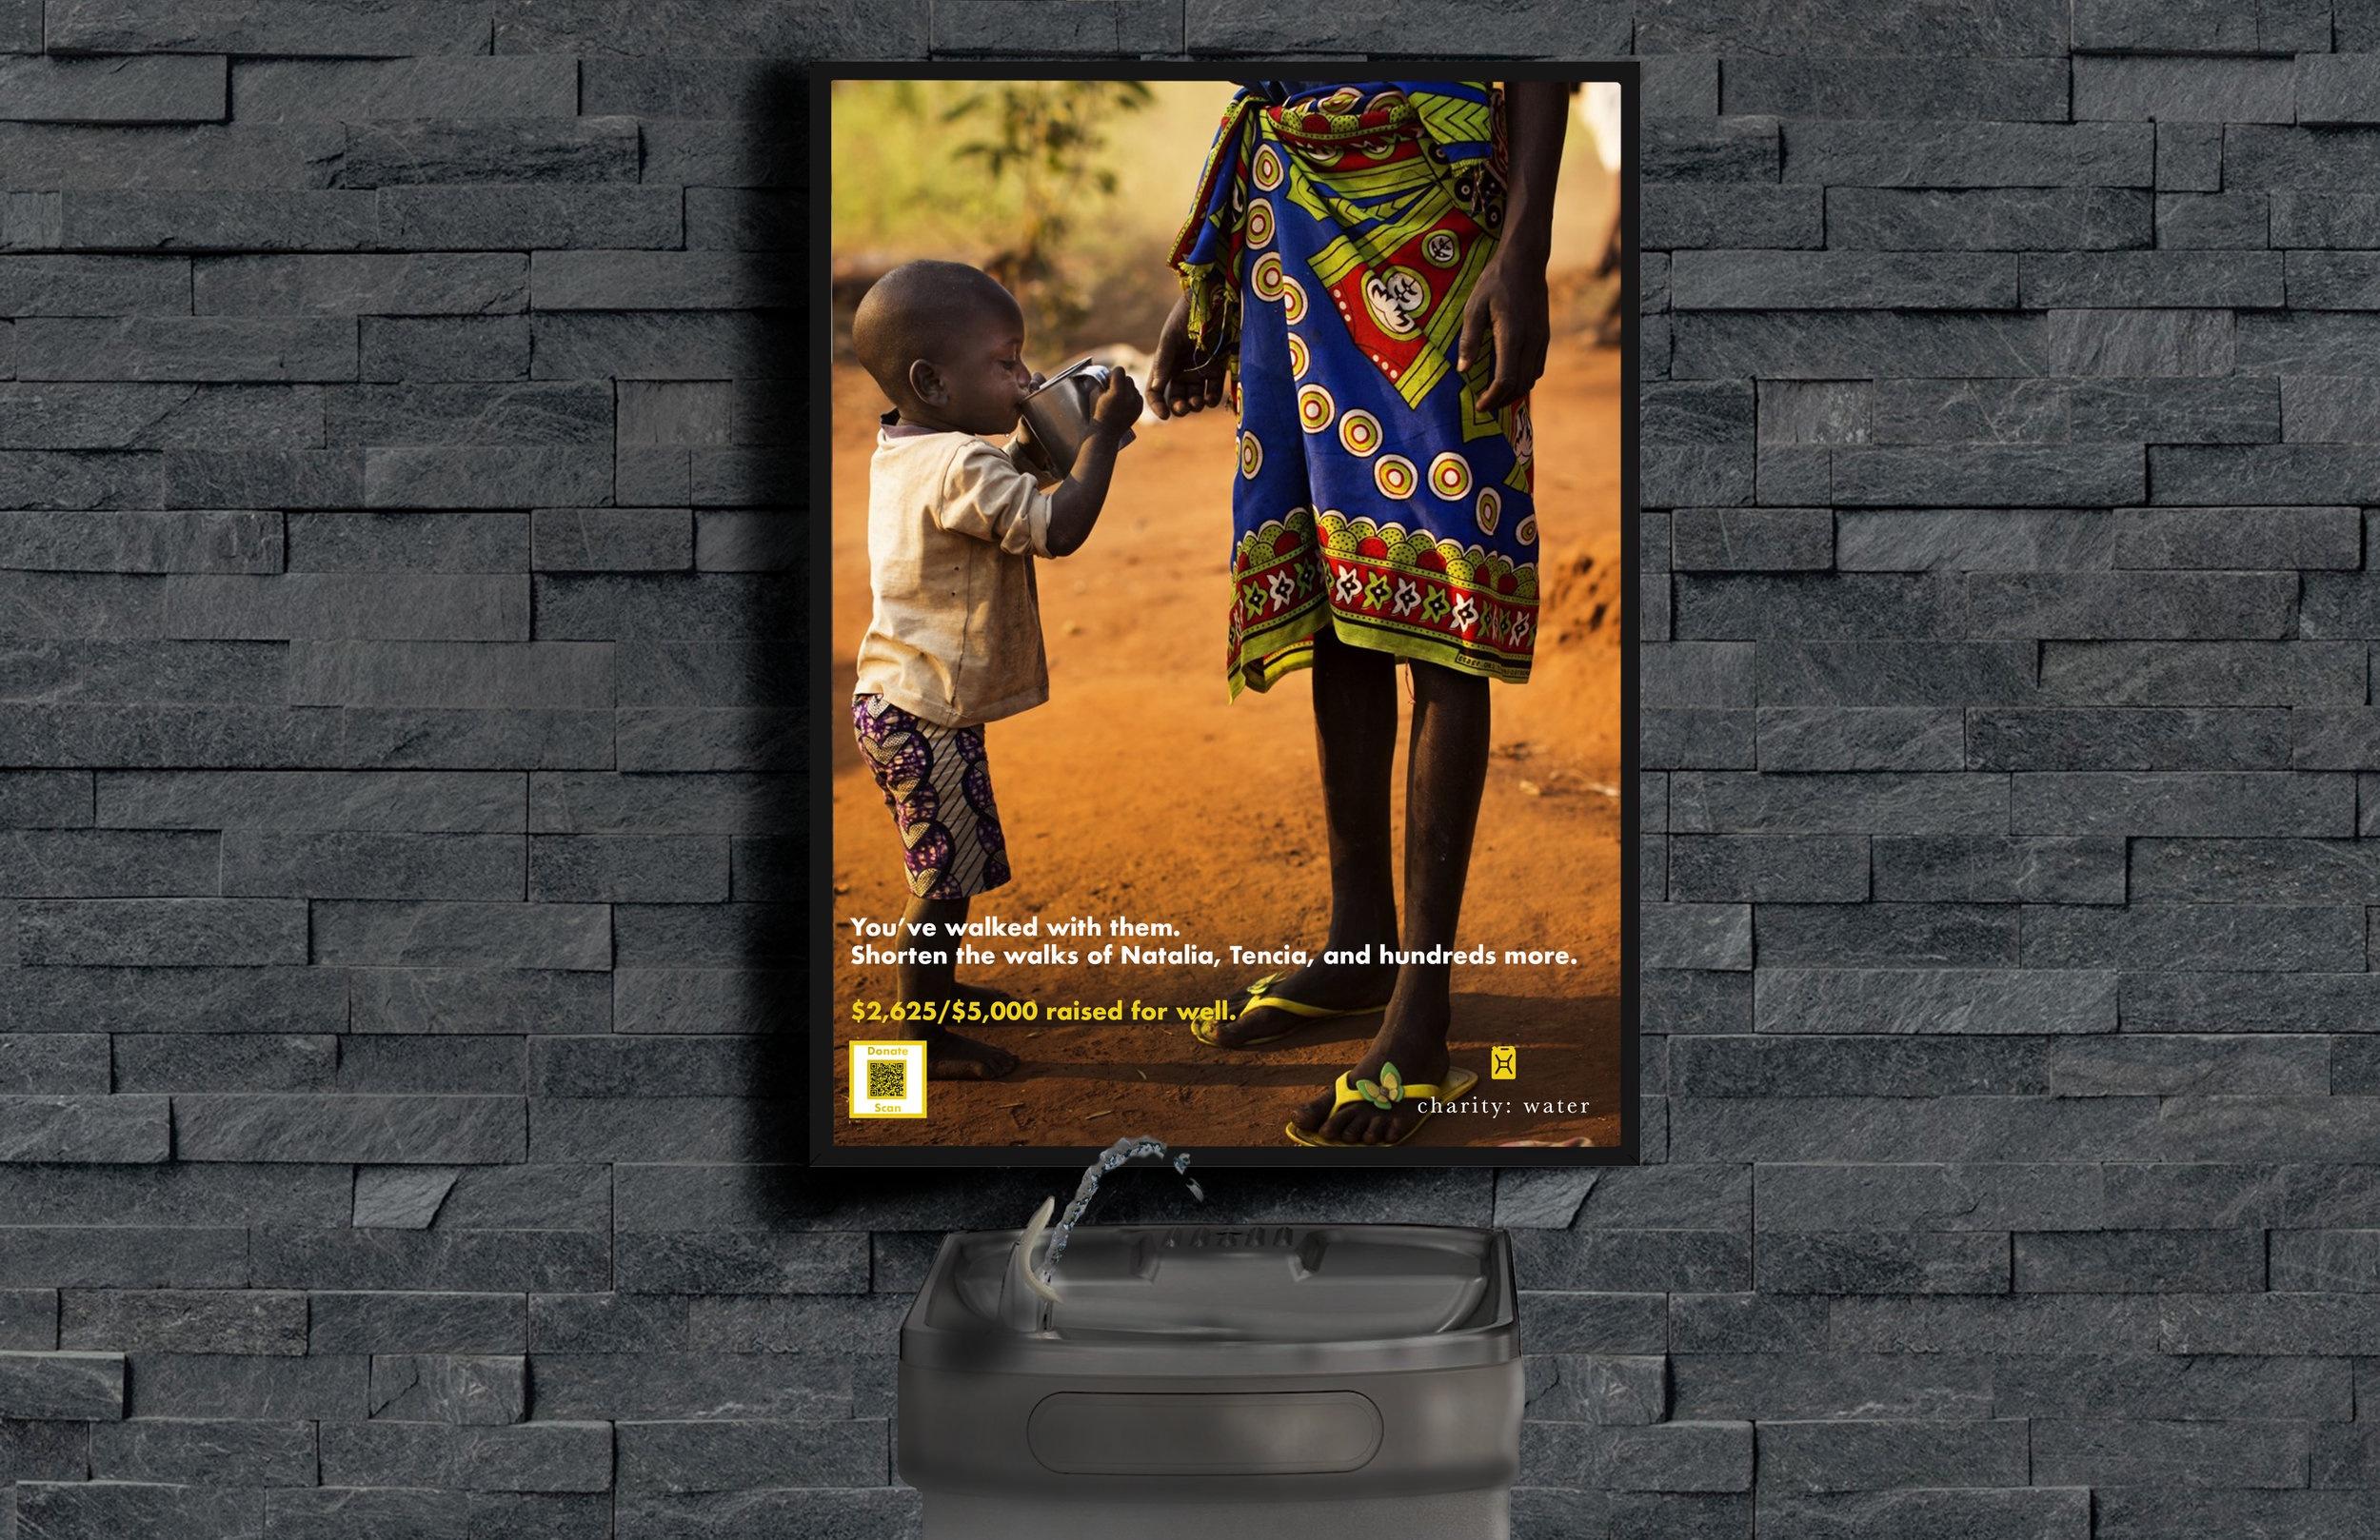 Charity+Water+Screen+3.jpg